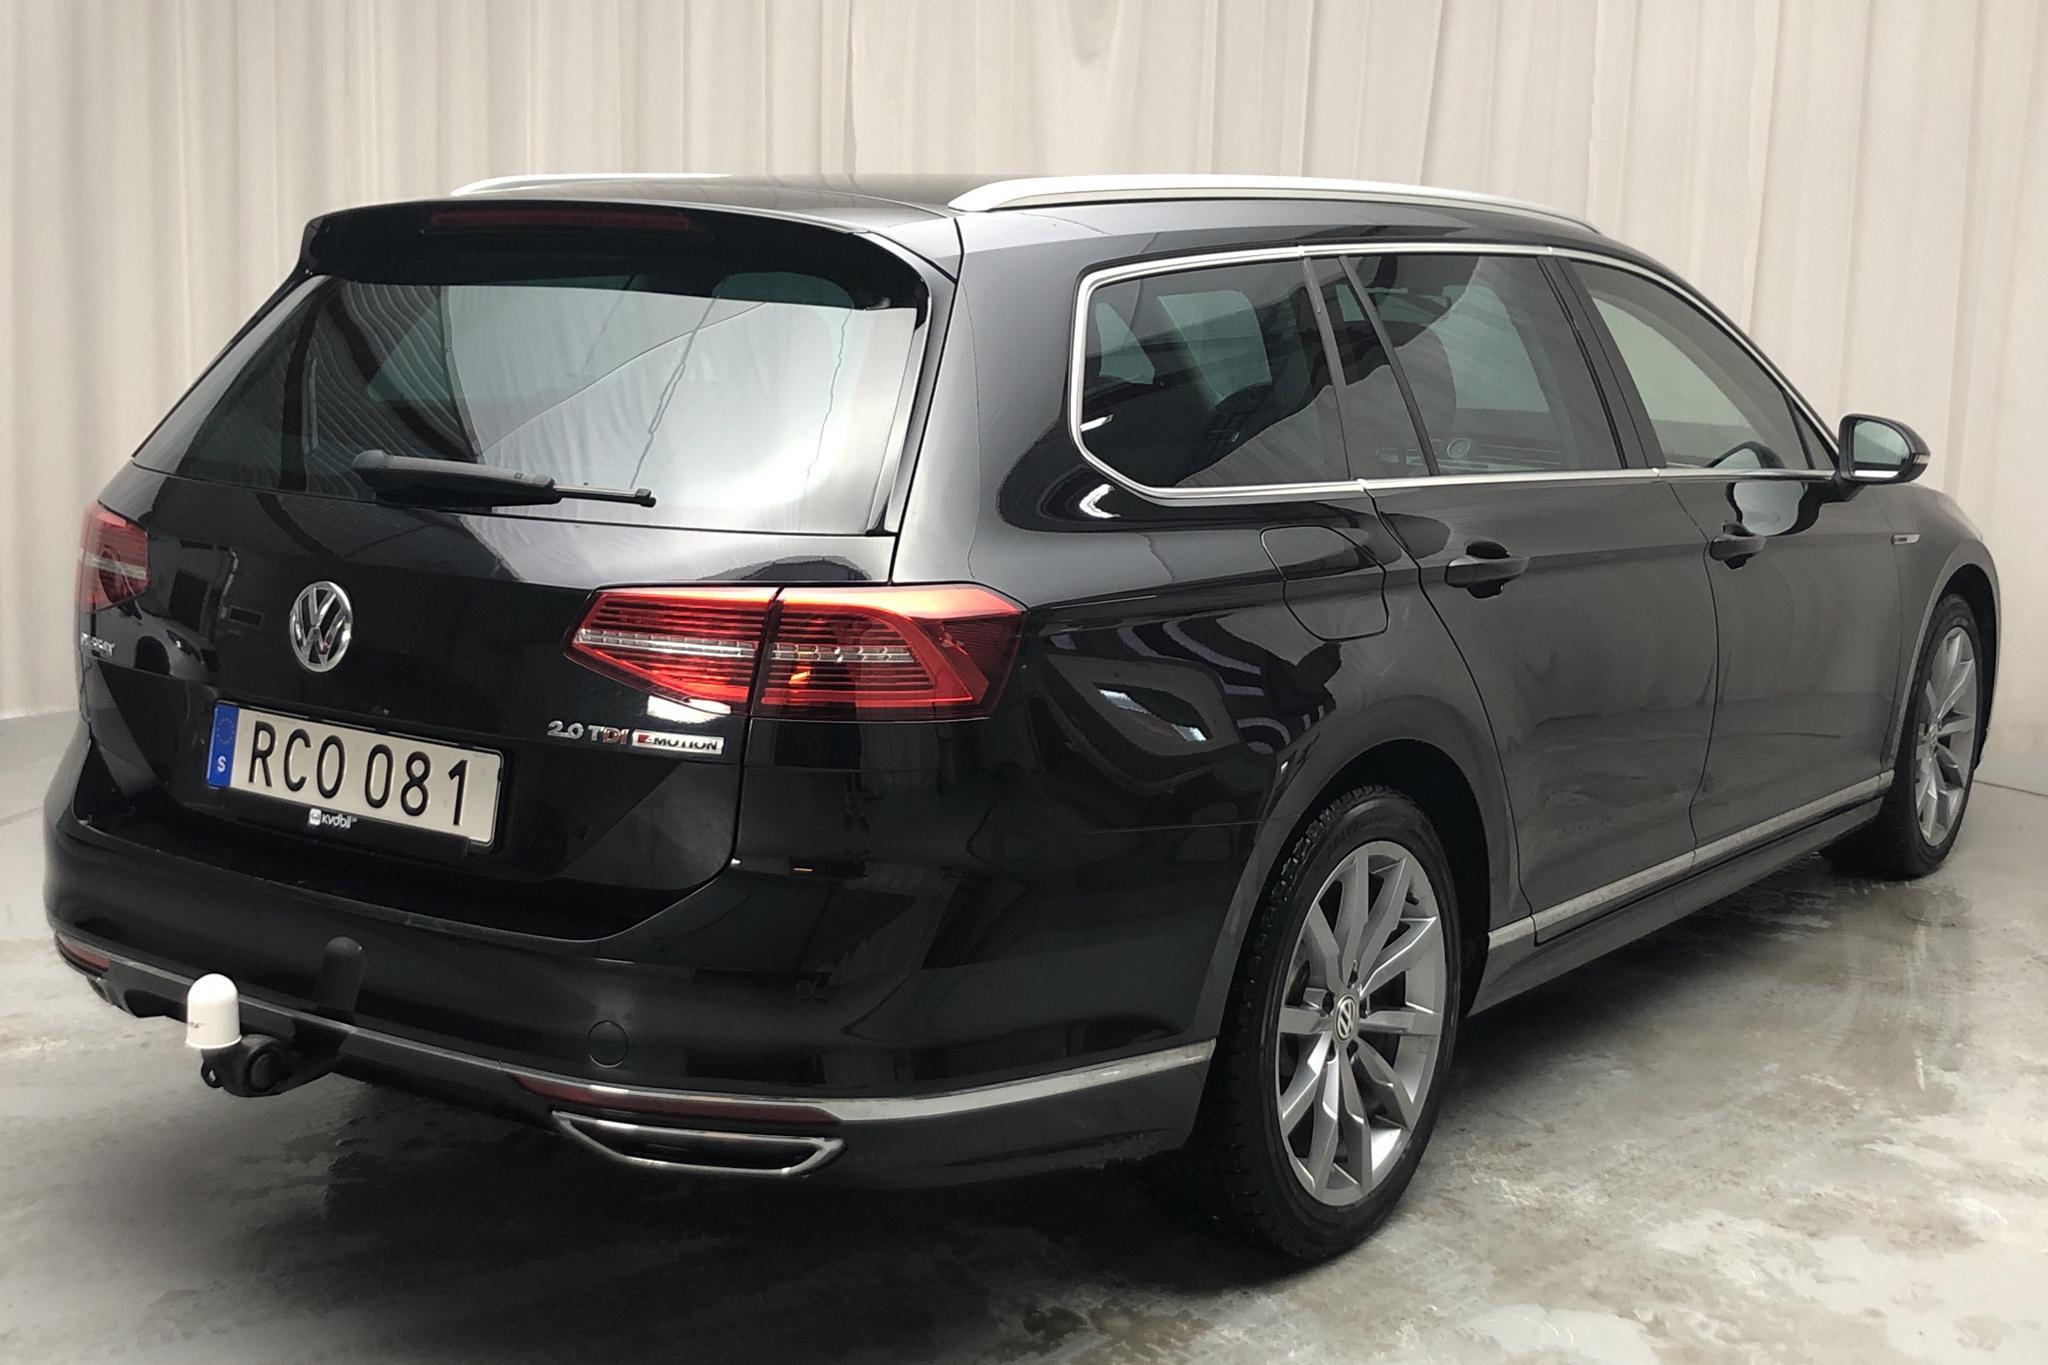 VW Passat 2.0 TDI Sportscombi 4MOTION (190hk) - 74 760 km - Automatic - black - 2017